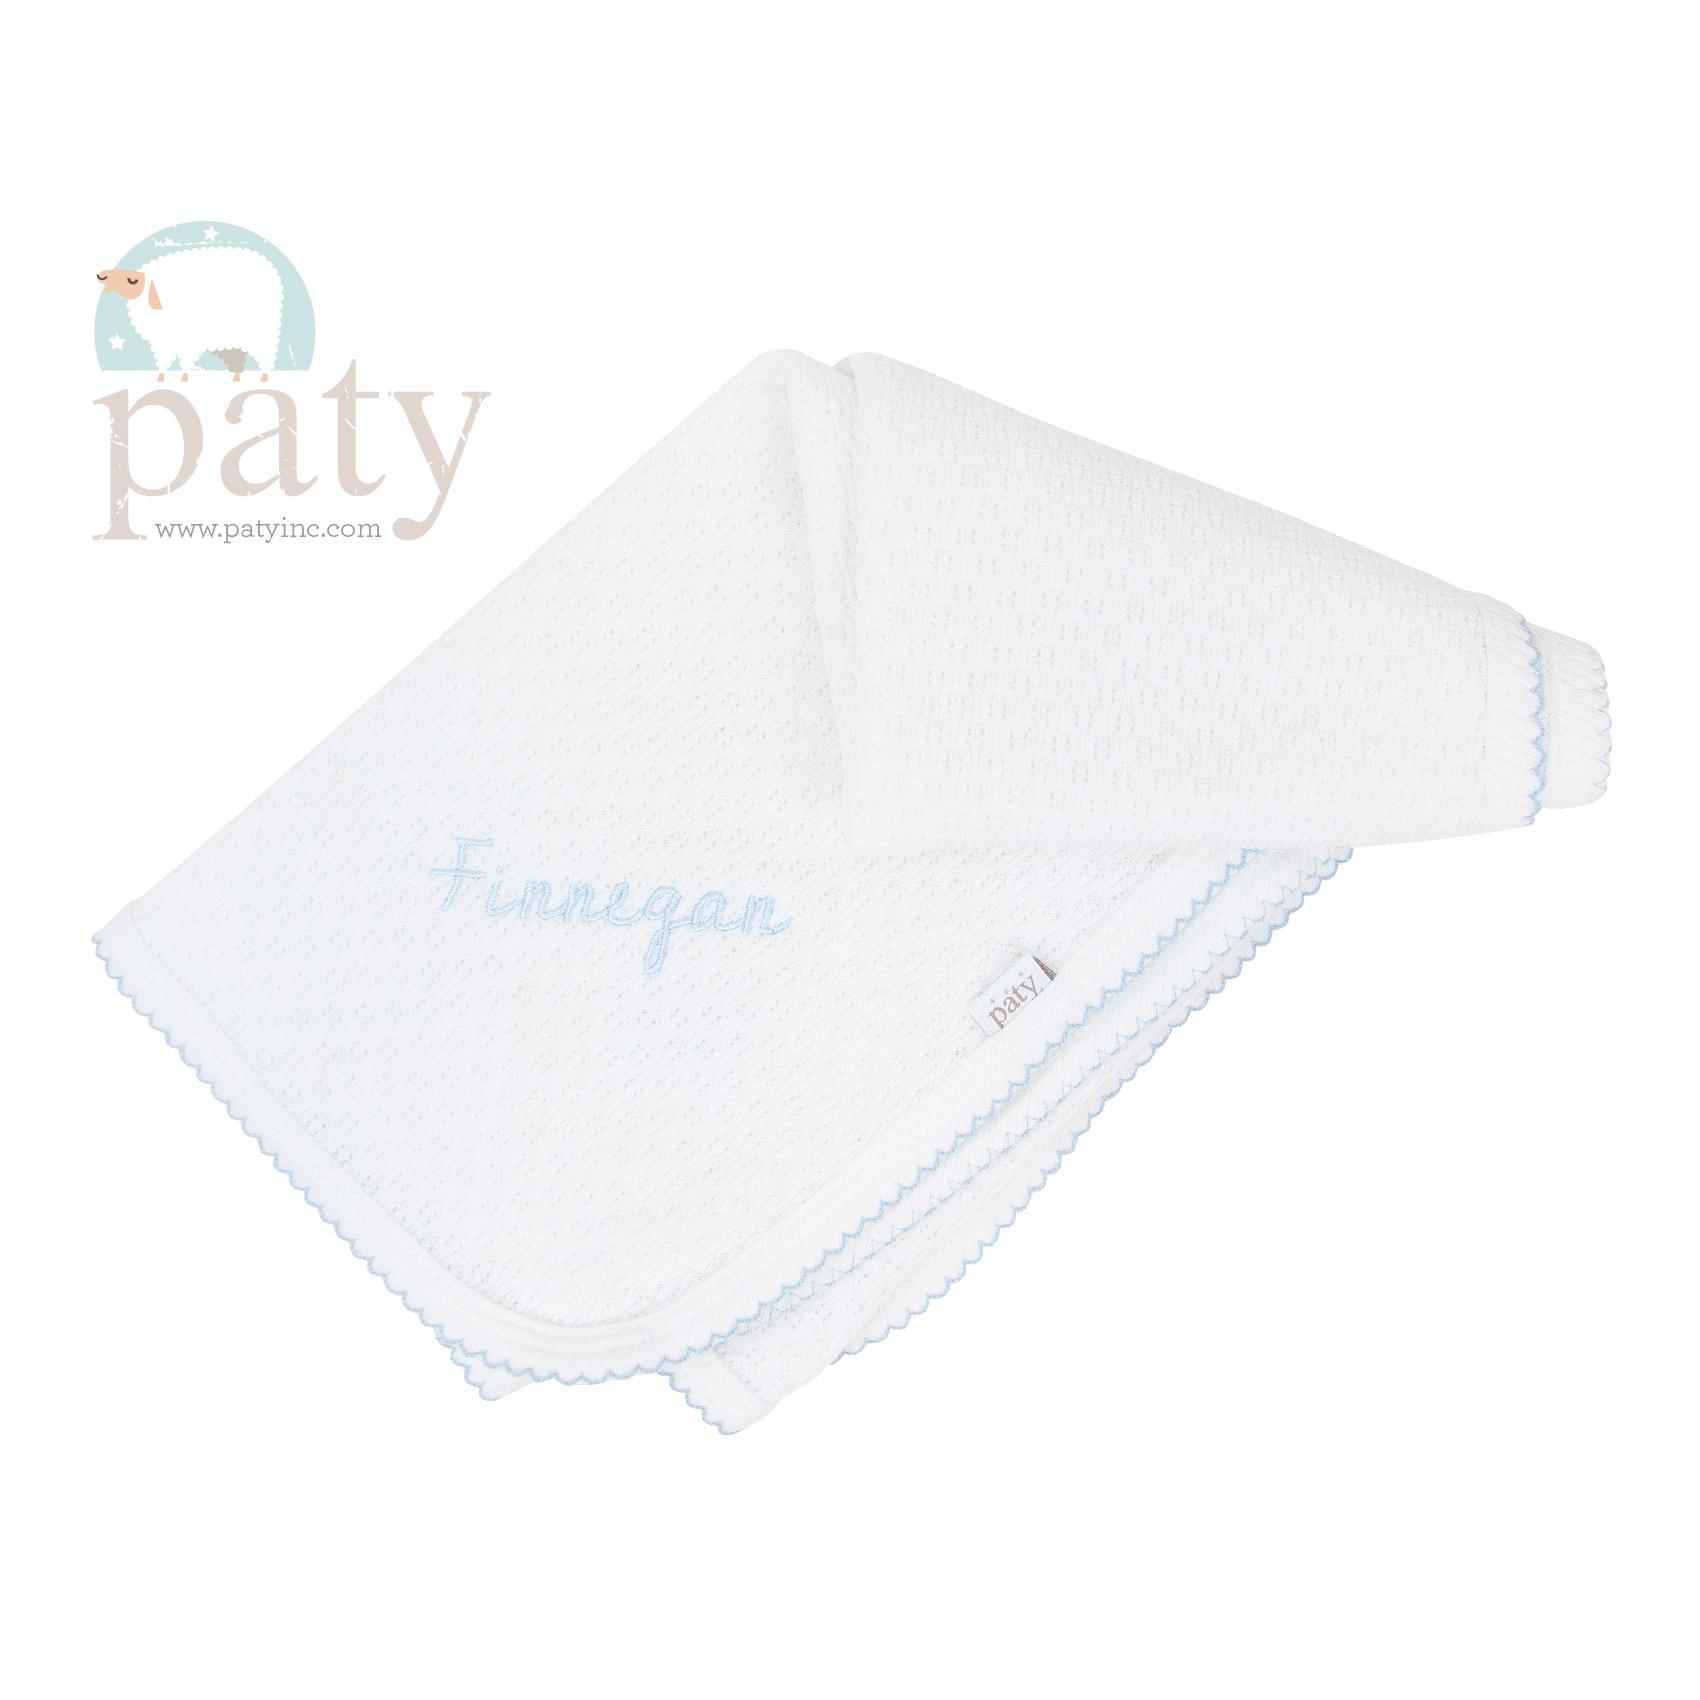 Monogrammed White Paty Blanket